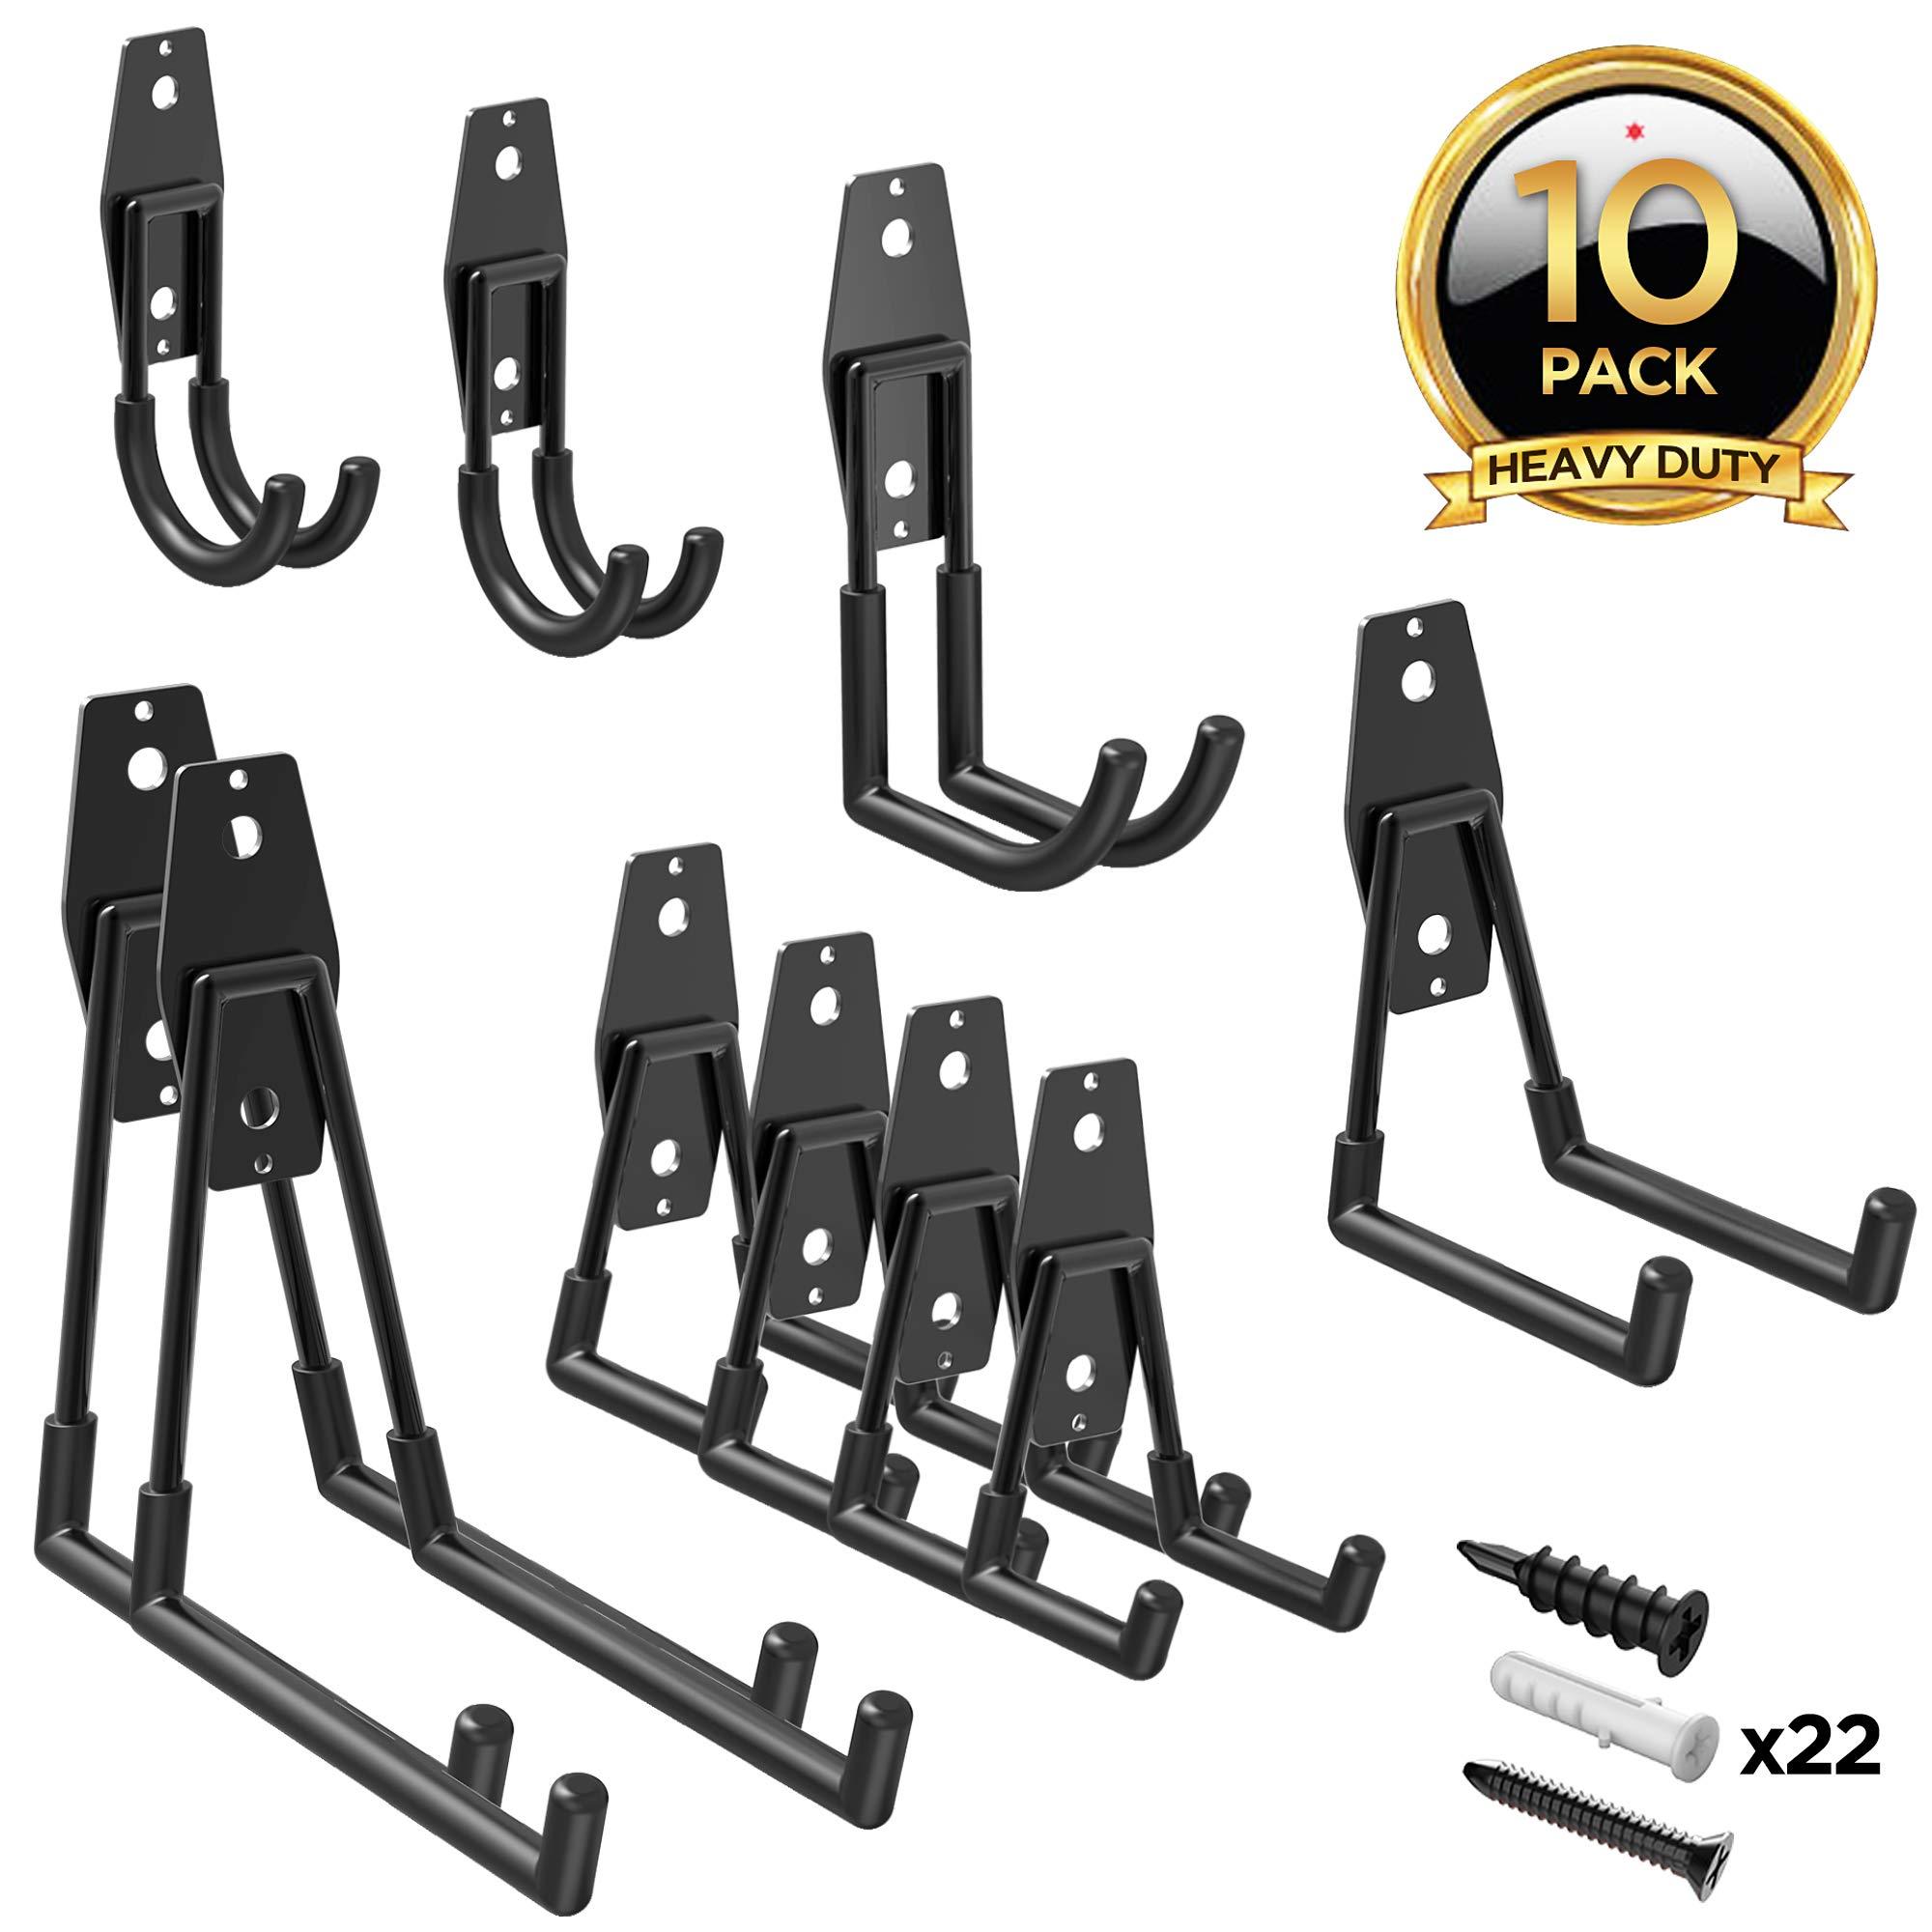 ORASANT 10-Pack Steel Garage Storage Utility Double Hooks, Heavy Duty for Organizing Power Tools, Ladders, Bulk Items, Bikes, Ropes etc. (Black)